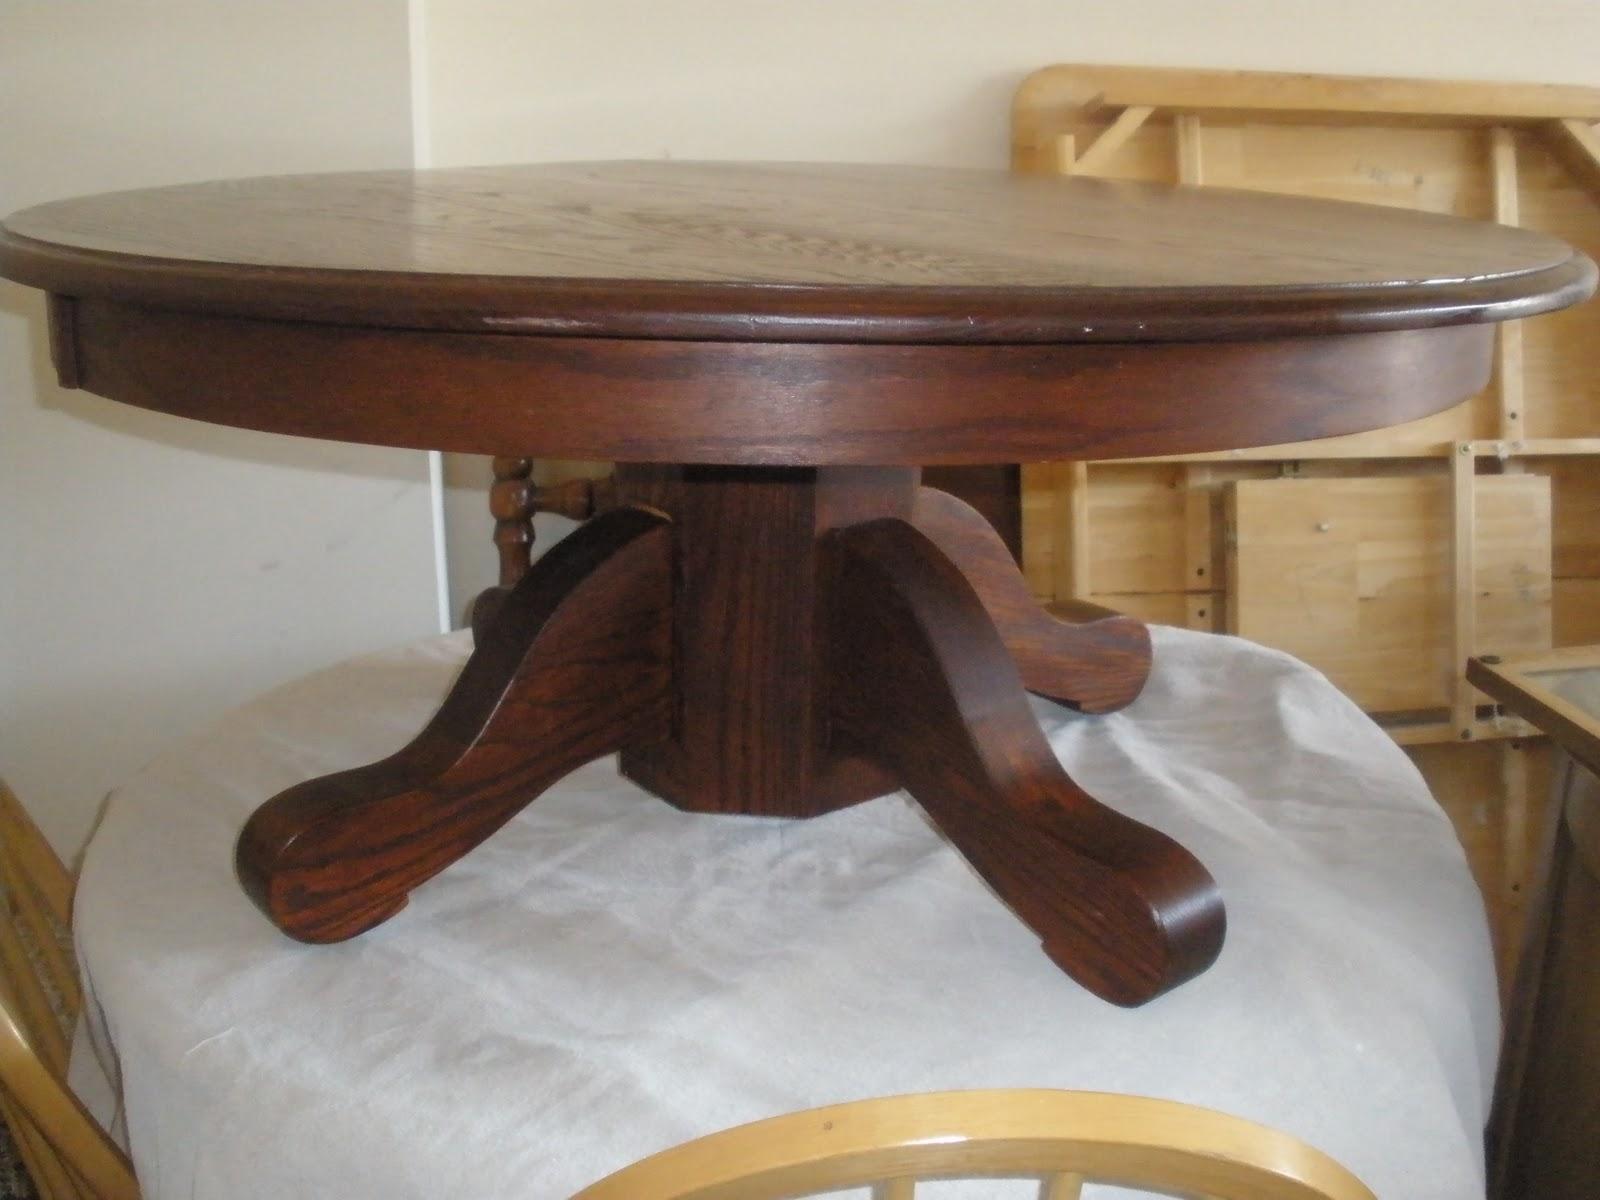 round-dark-wood-coffee-table-dark-wood-coffee-table-sets-round-wooden-coffee-table-dark-wood-round-side-tables (Image 5 of 10)